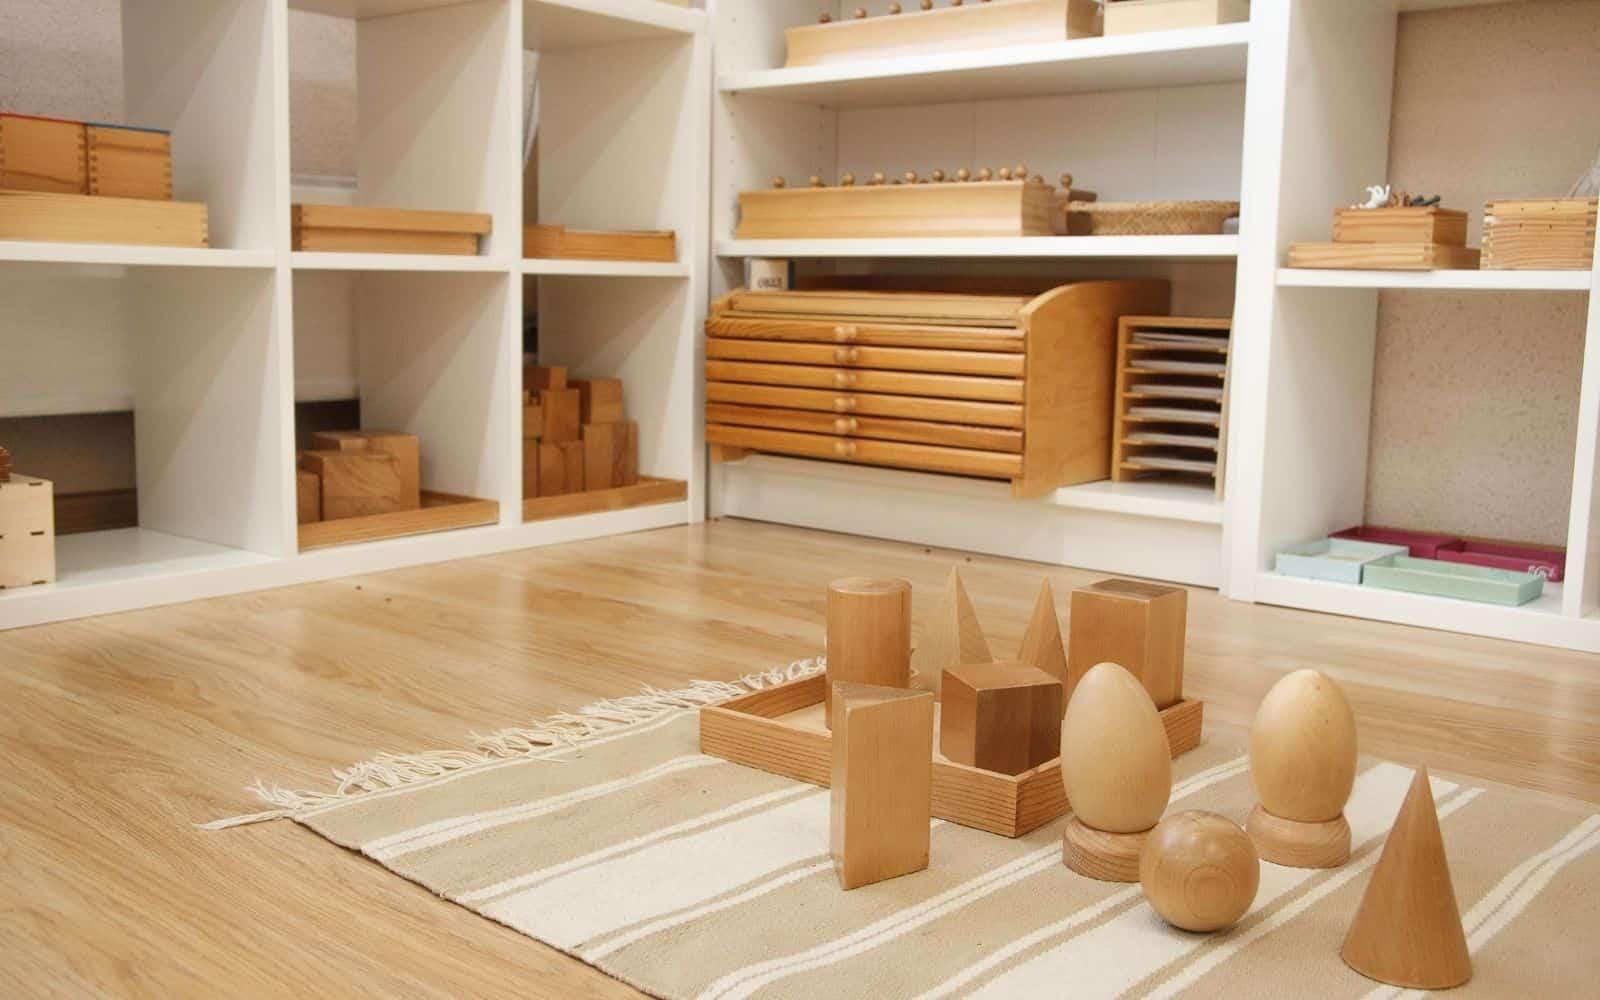 Montessori furniture in toddler classroom